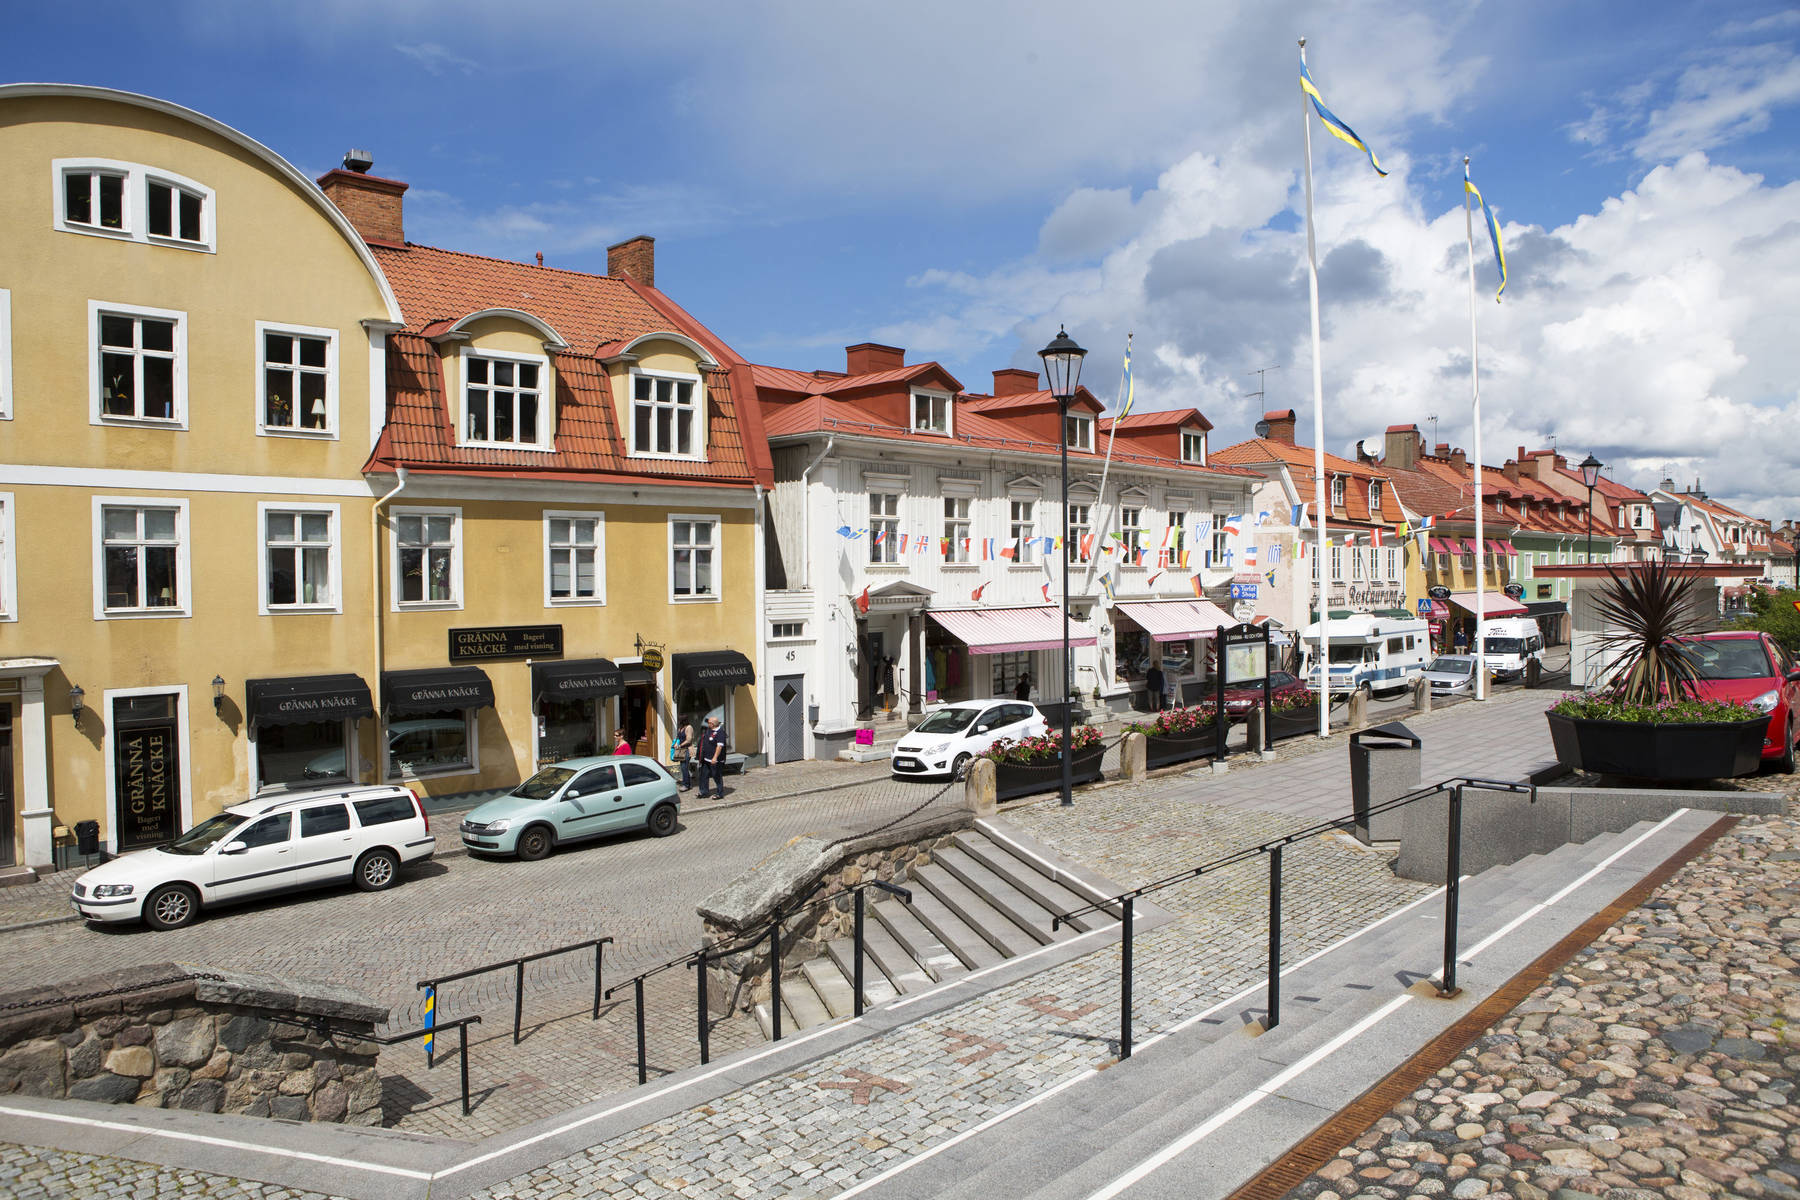 Gränna city